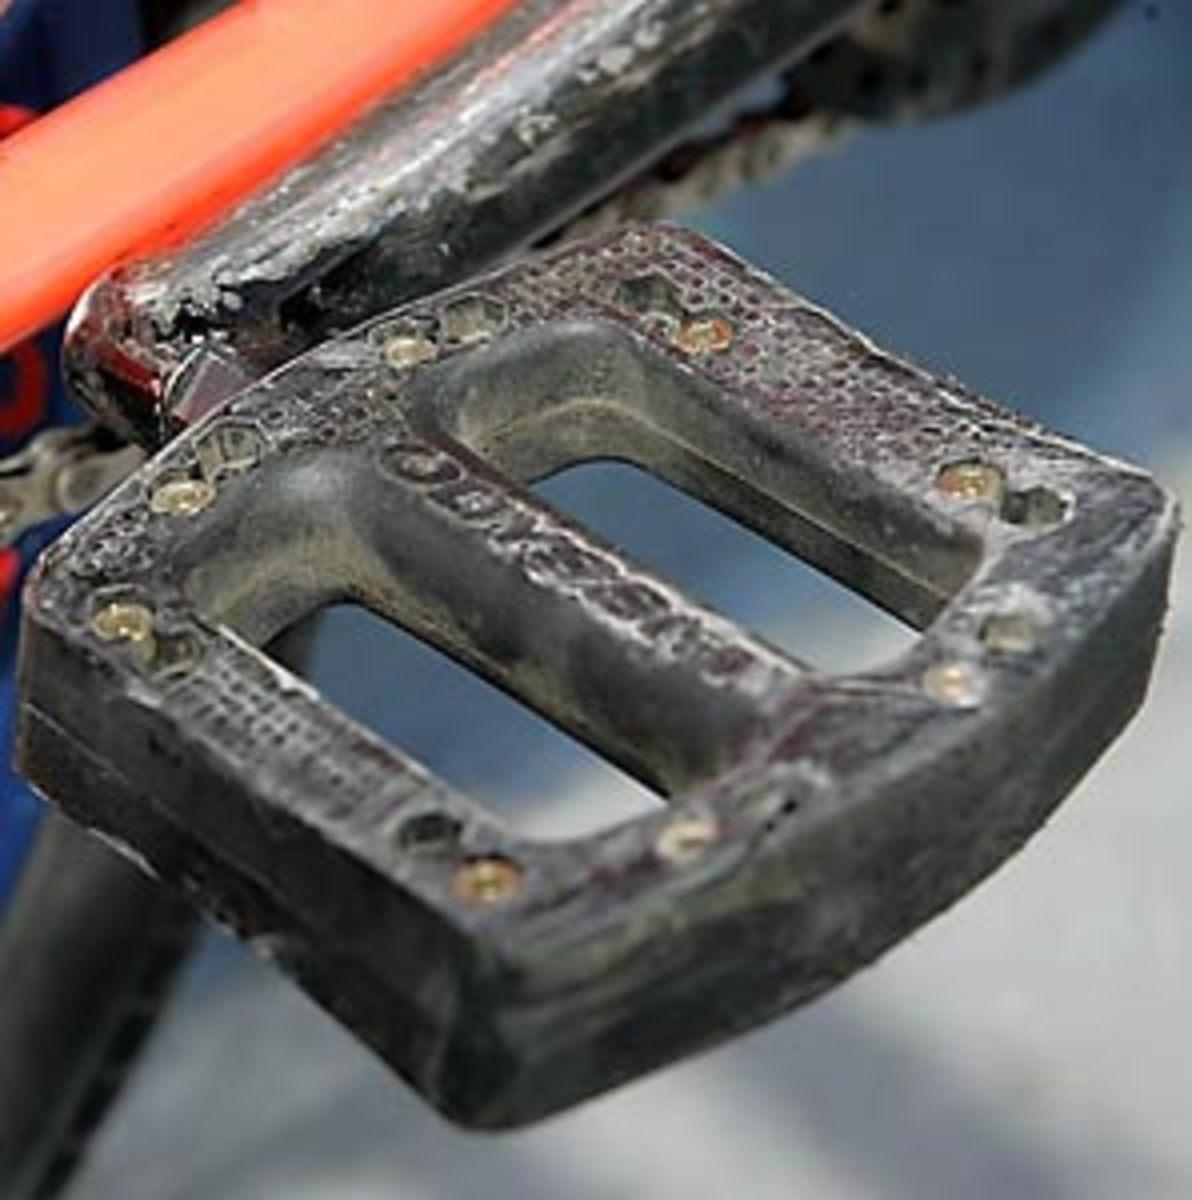 odyssey-pedals.jpg